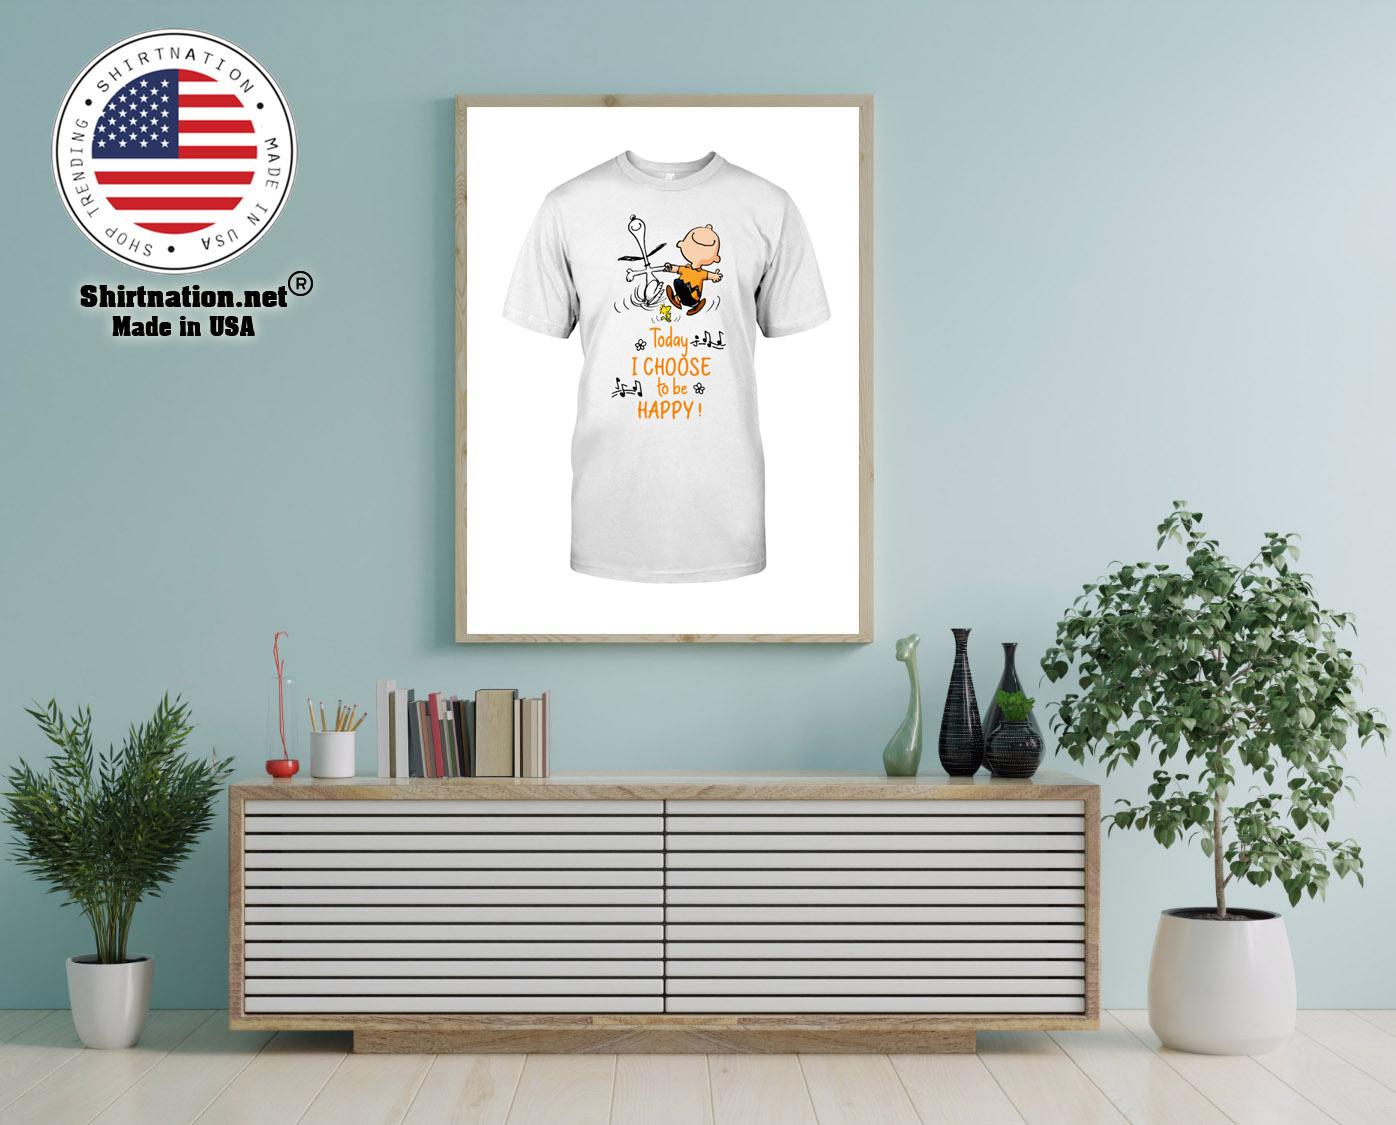 Peanuts Snoopy today i choose to be happy shirt 12